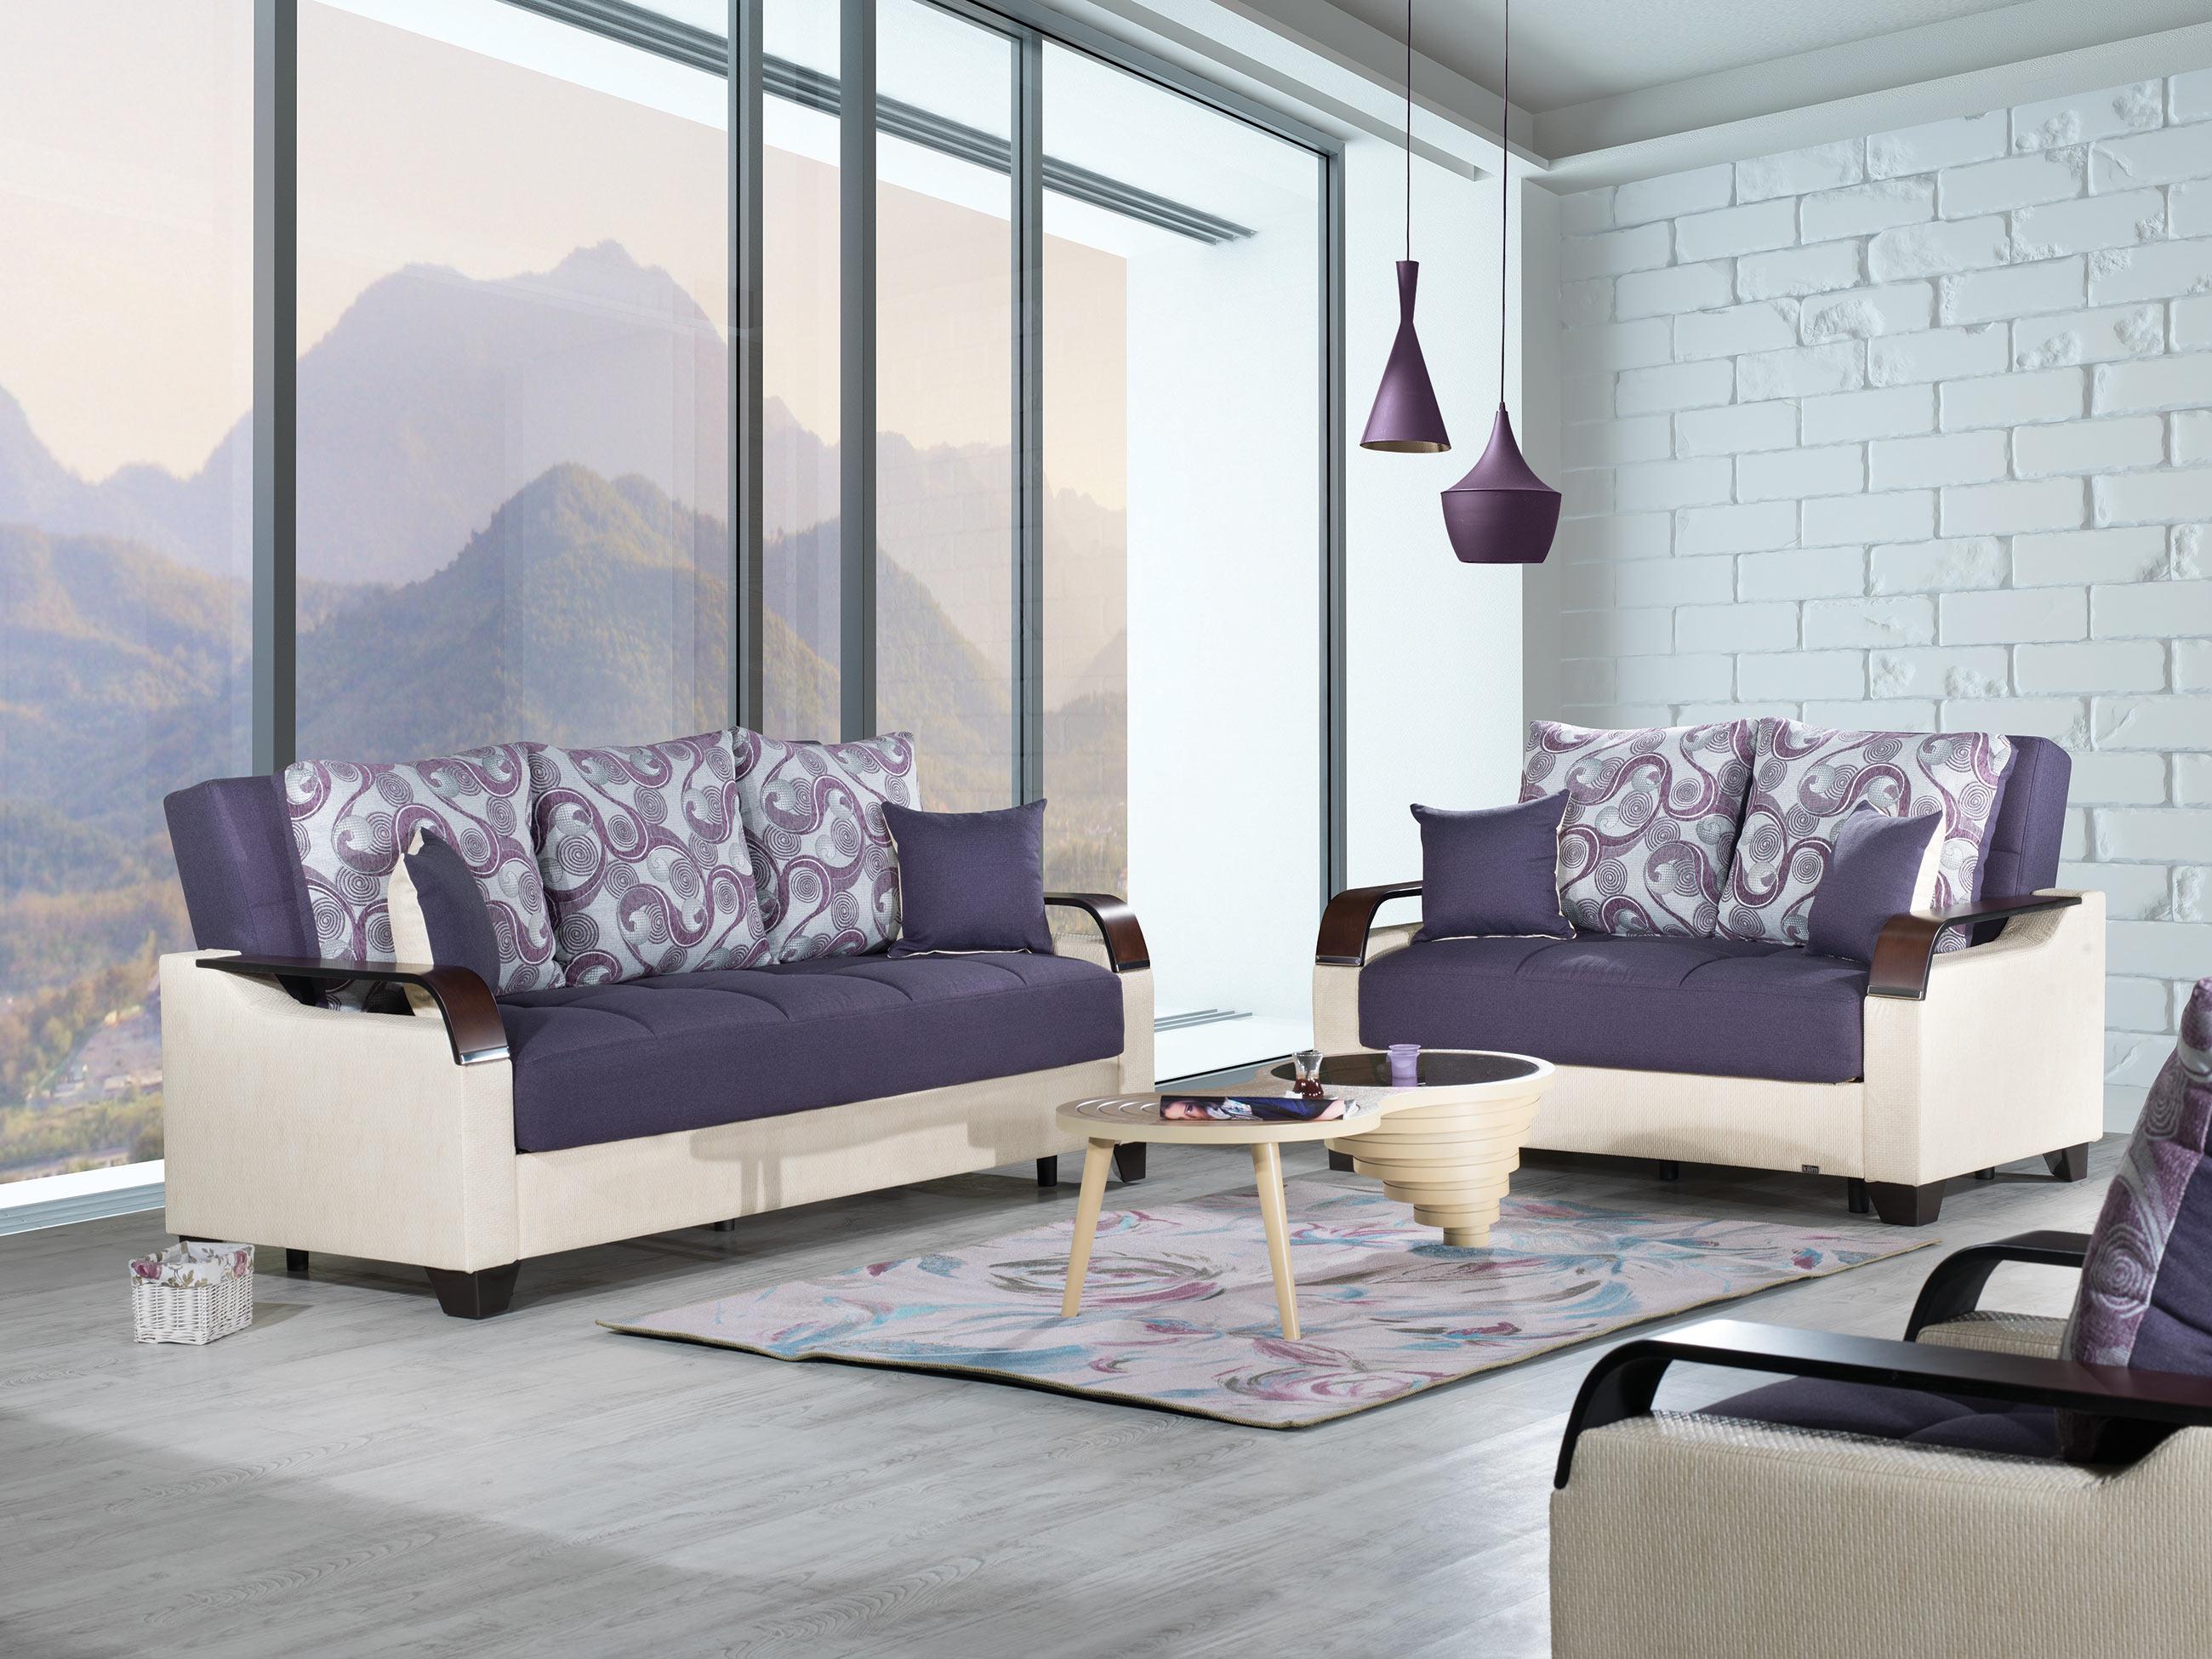 La Reina Moon Dark Purple Convertible Sofa Bed By Casamode